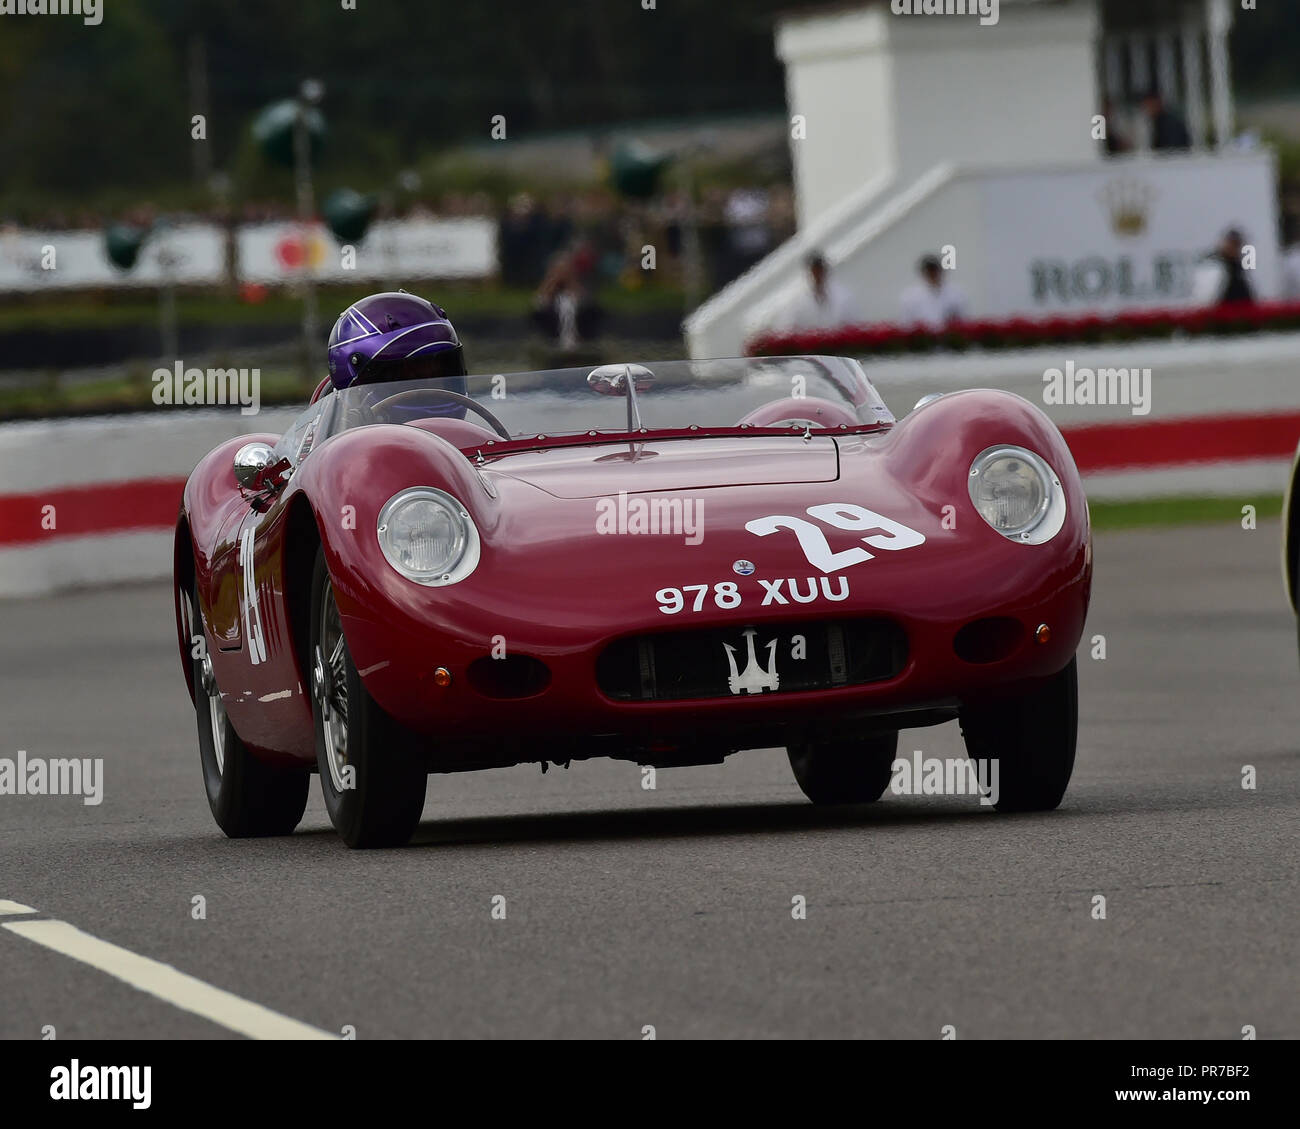 Steve Glynn, Maserati 200 Si, Freddie März Memorial Trophy, Sportwagen, 1952 bis 1955, Goodwood Revival 2018, September 2018, Automobile, Autos, Circus Stockbild